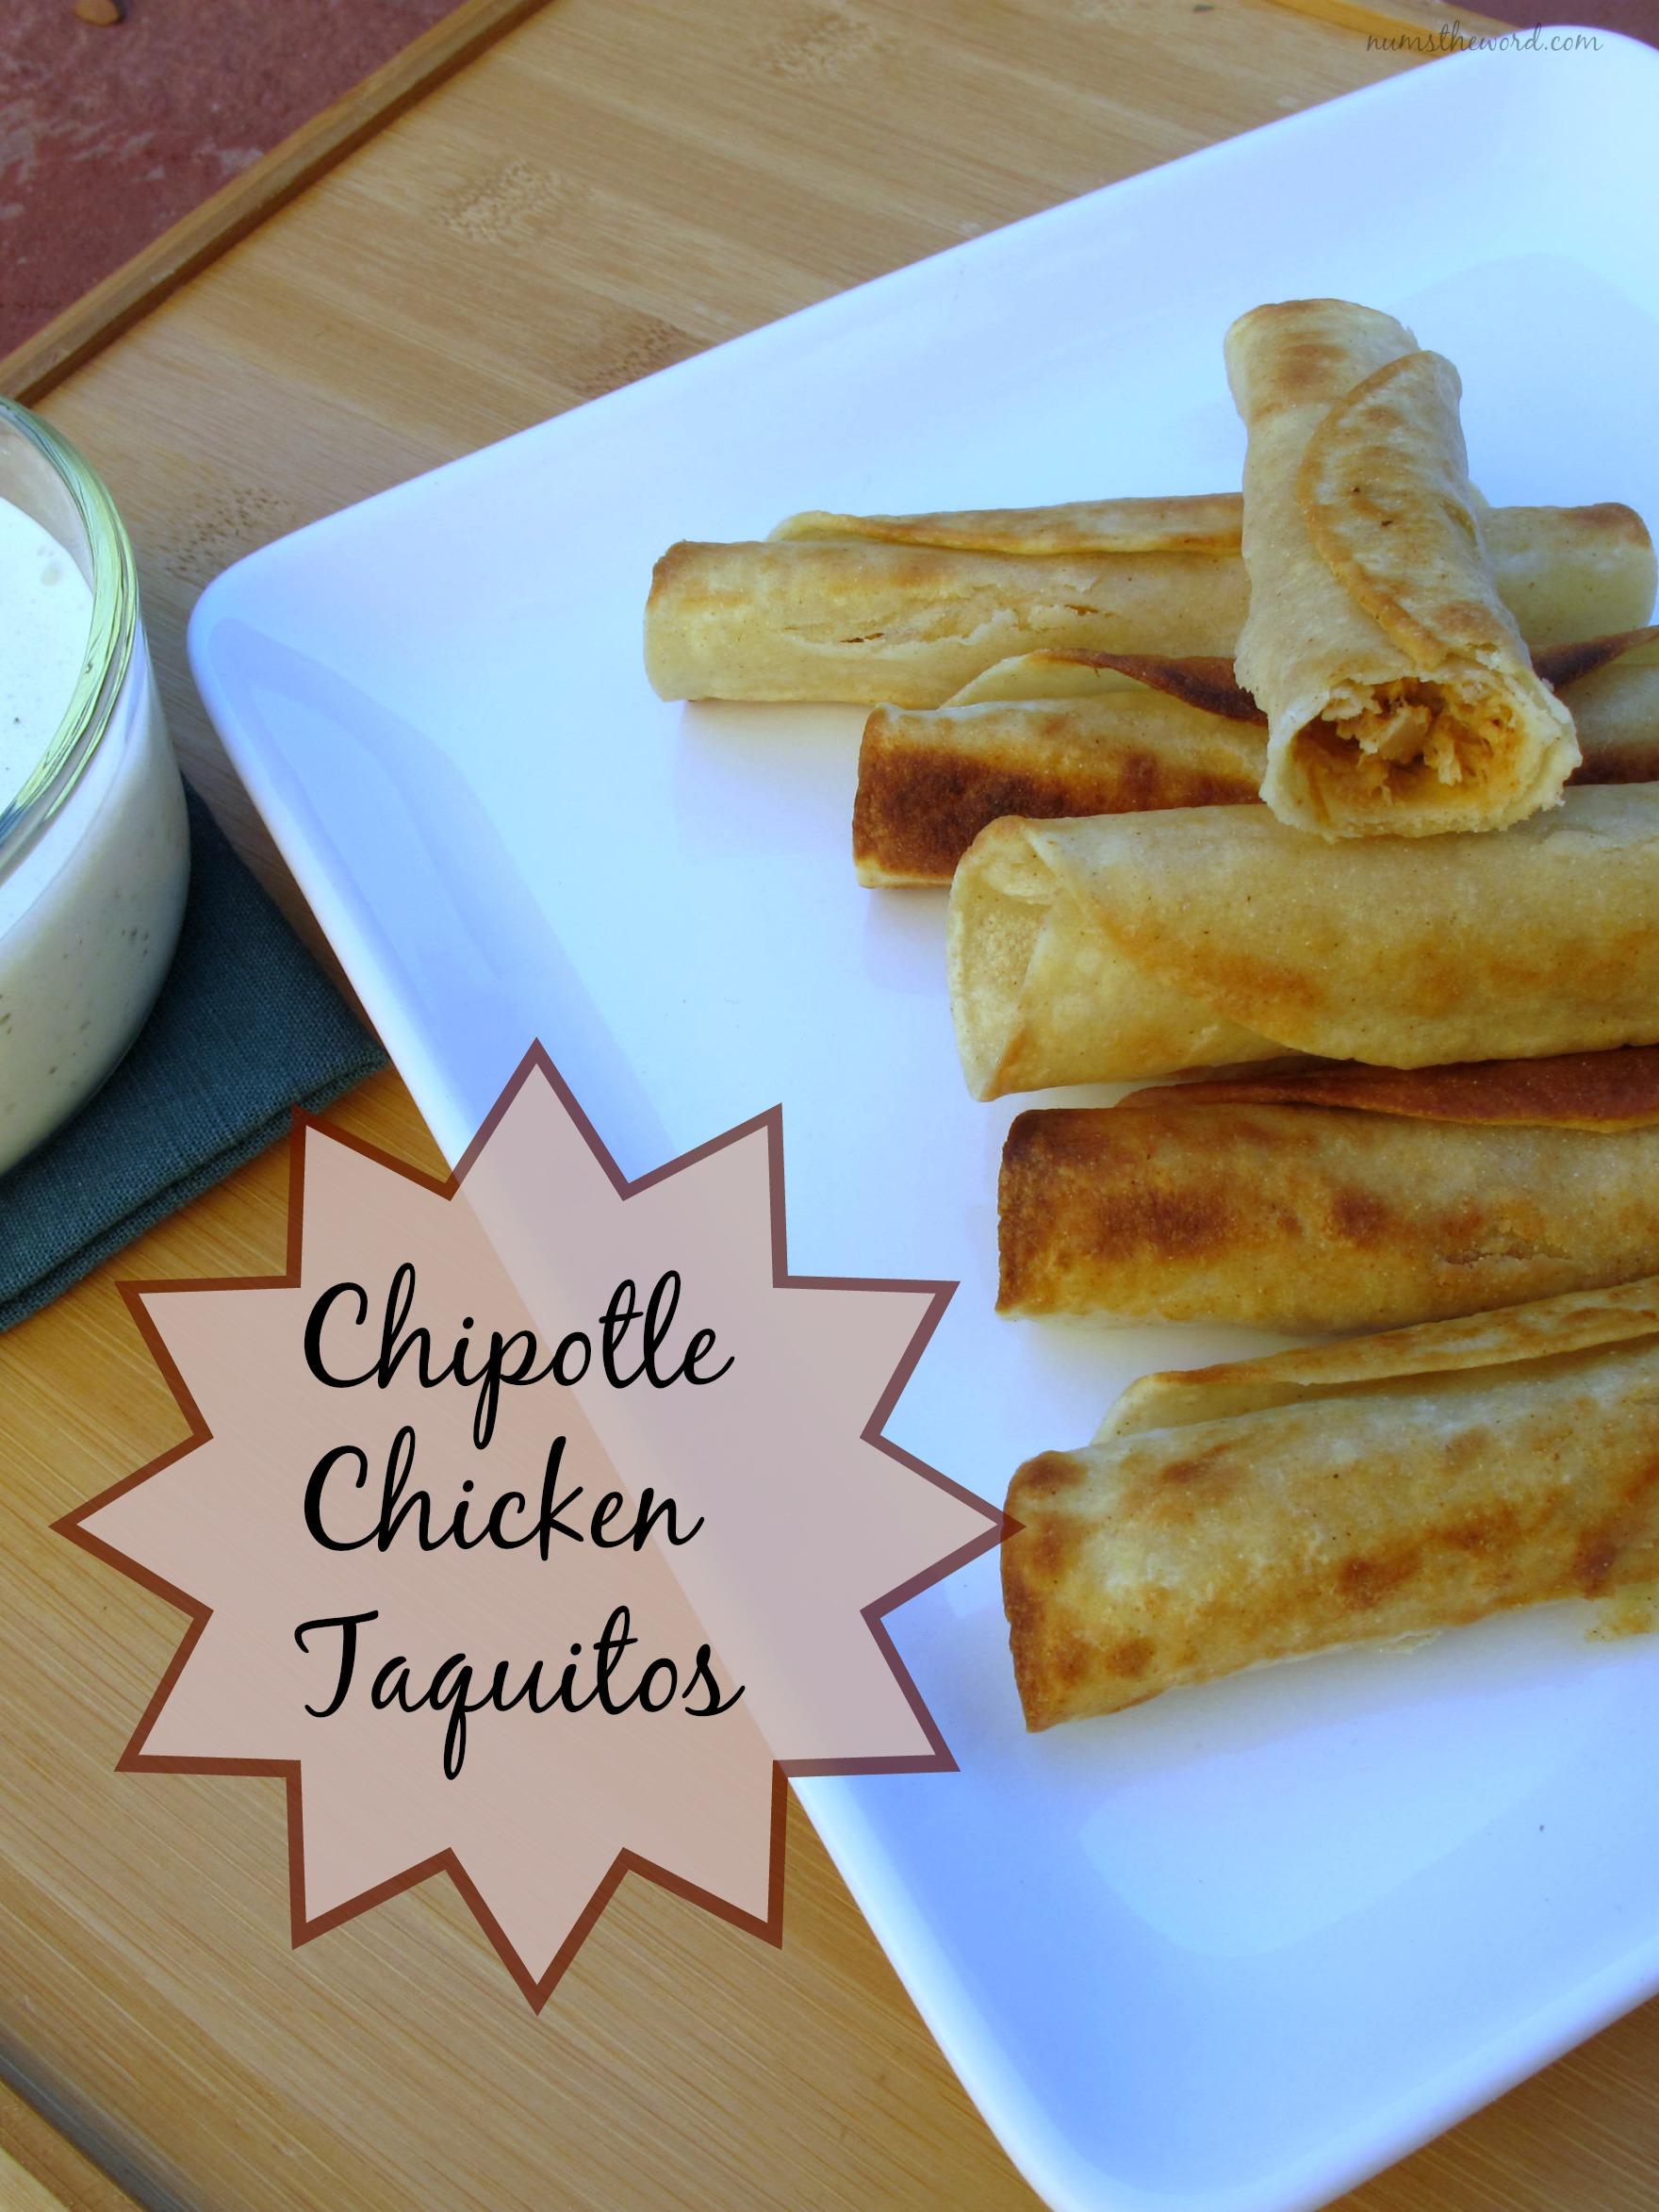 Chipotle Chicken Taquitos